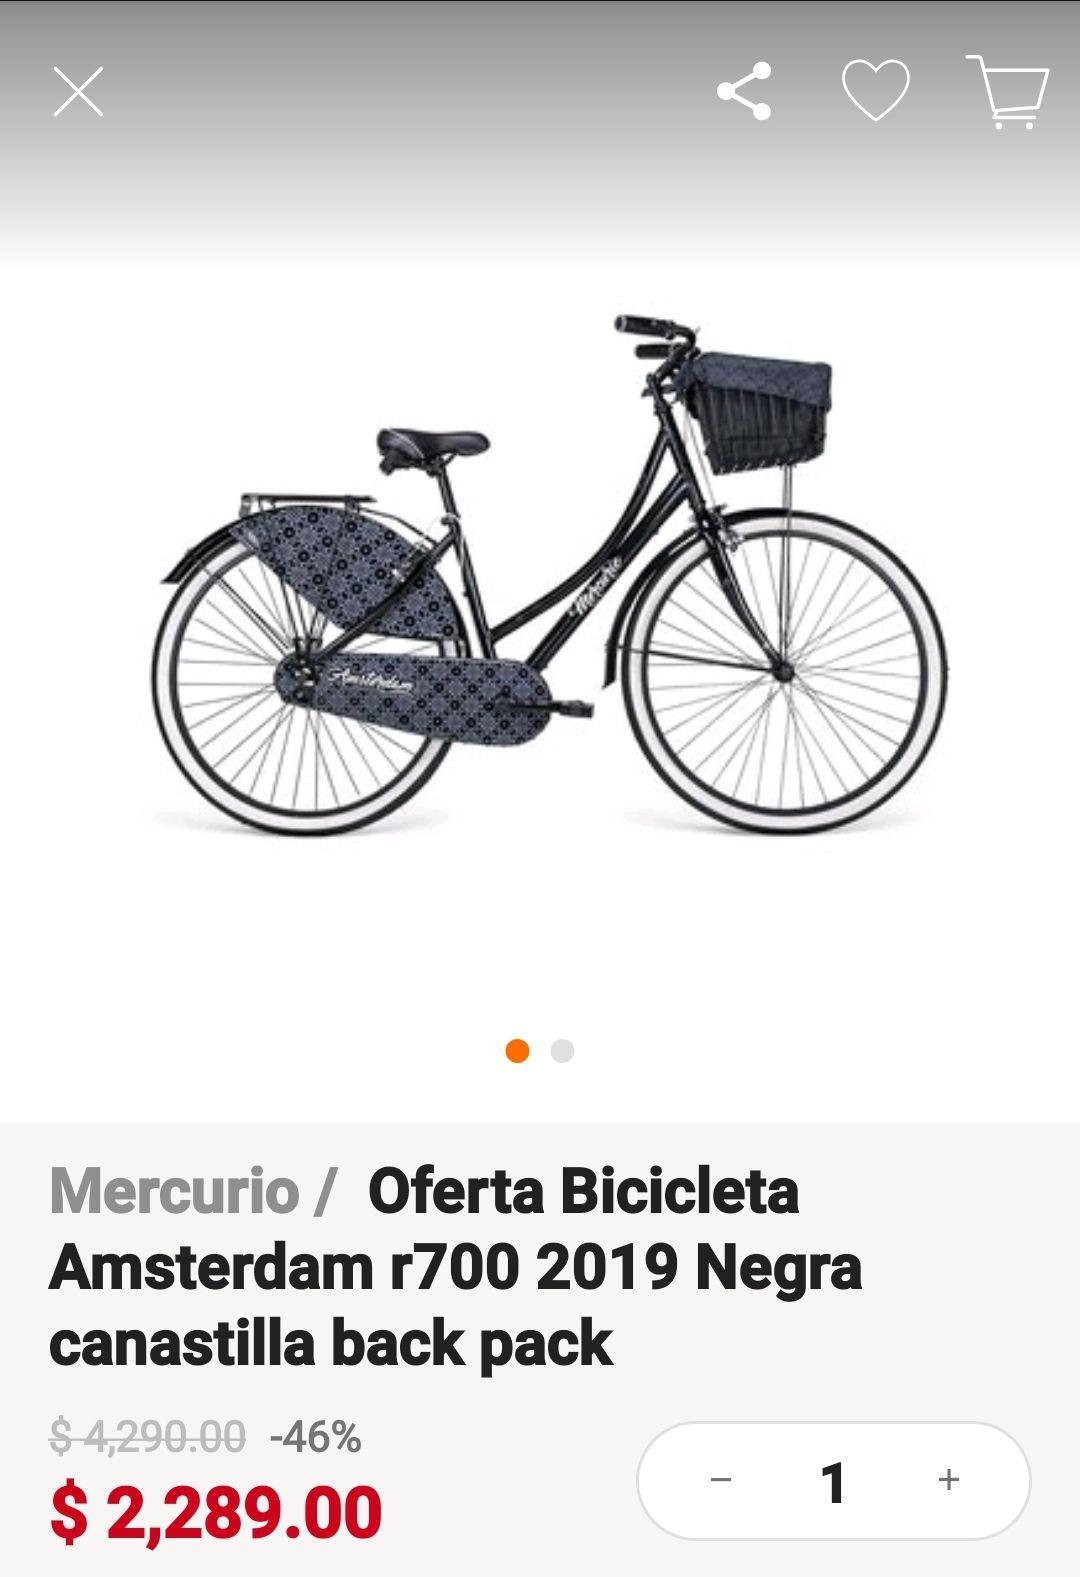 Linio: Bicicleta Amterdam r700 2019